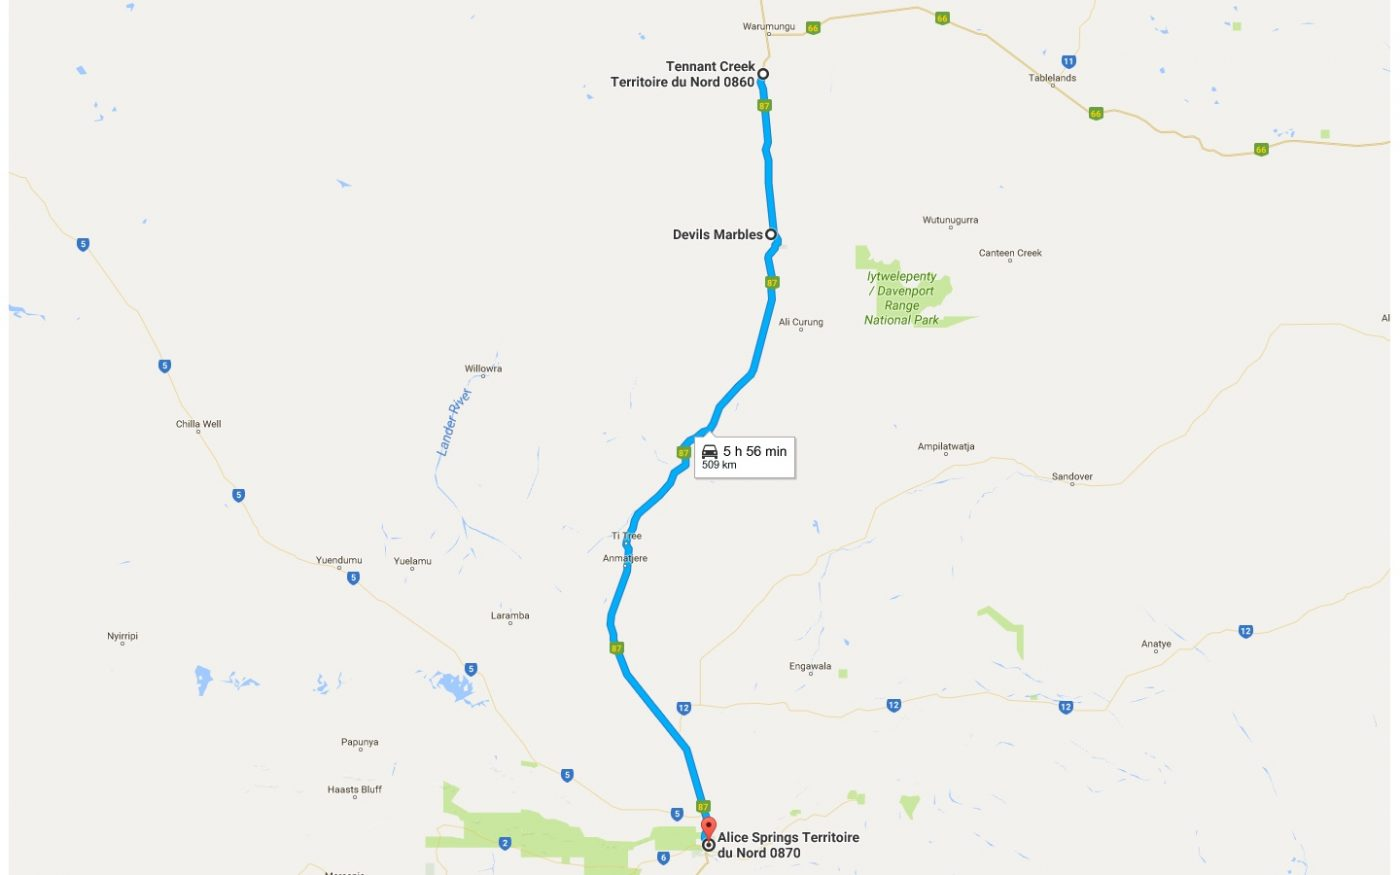 Trajet Tennant Creek - Alice Springs